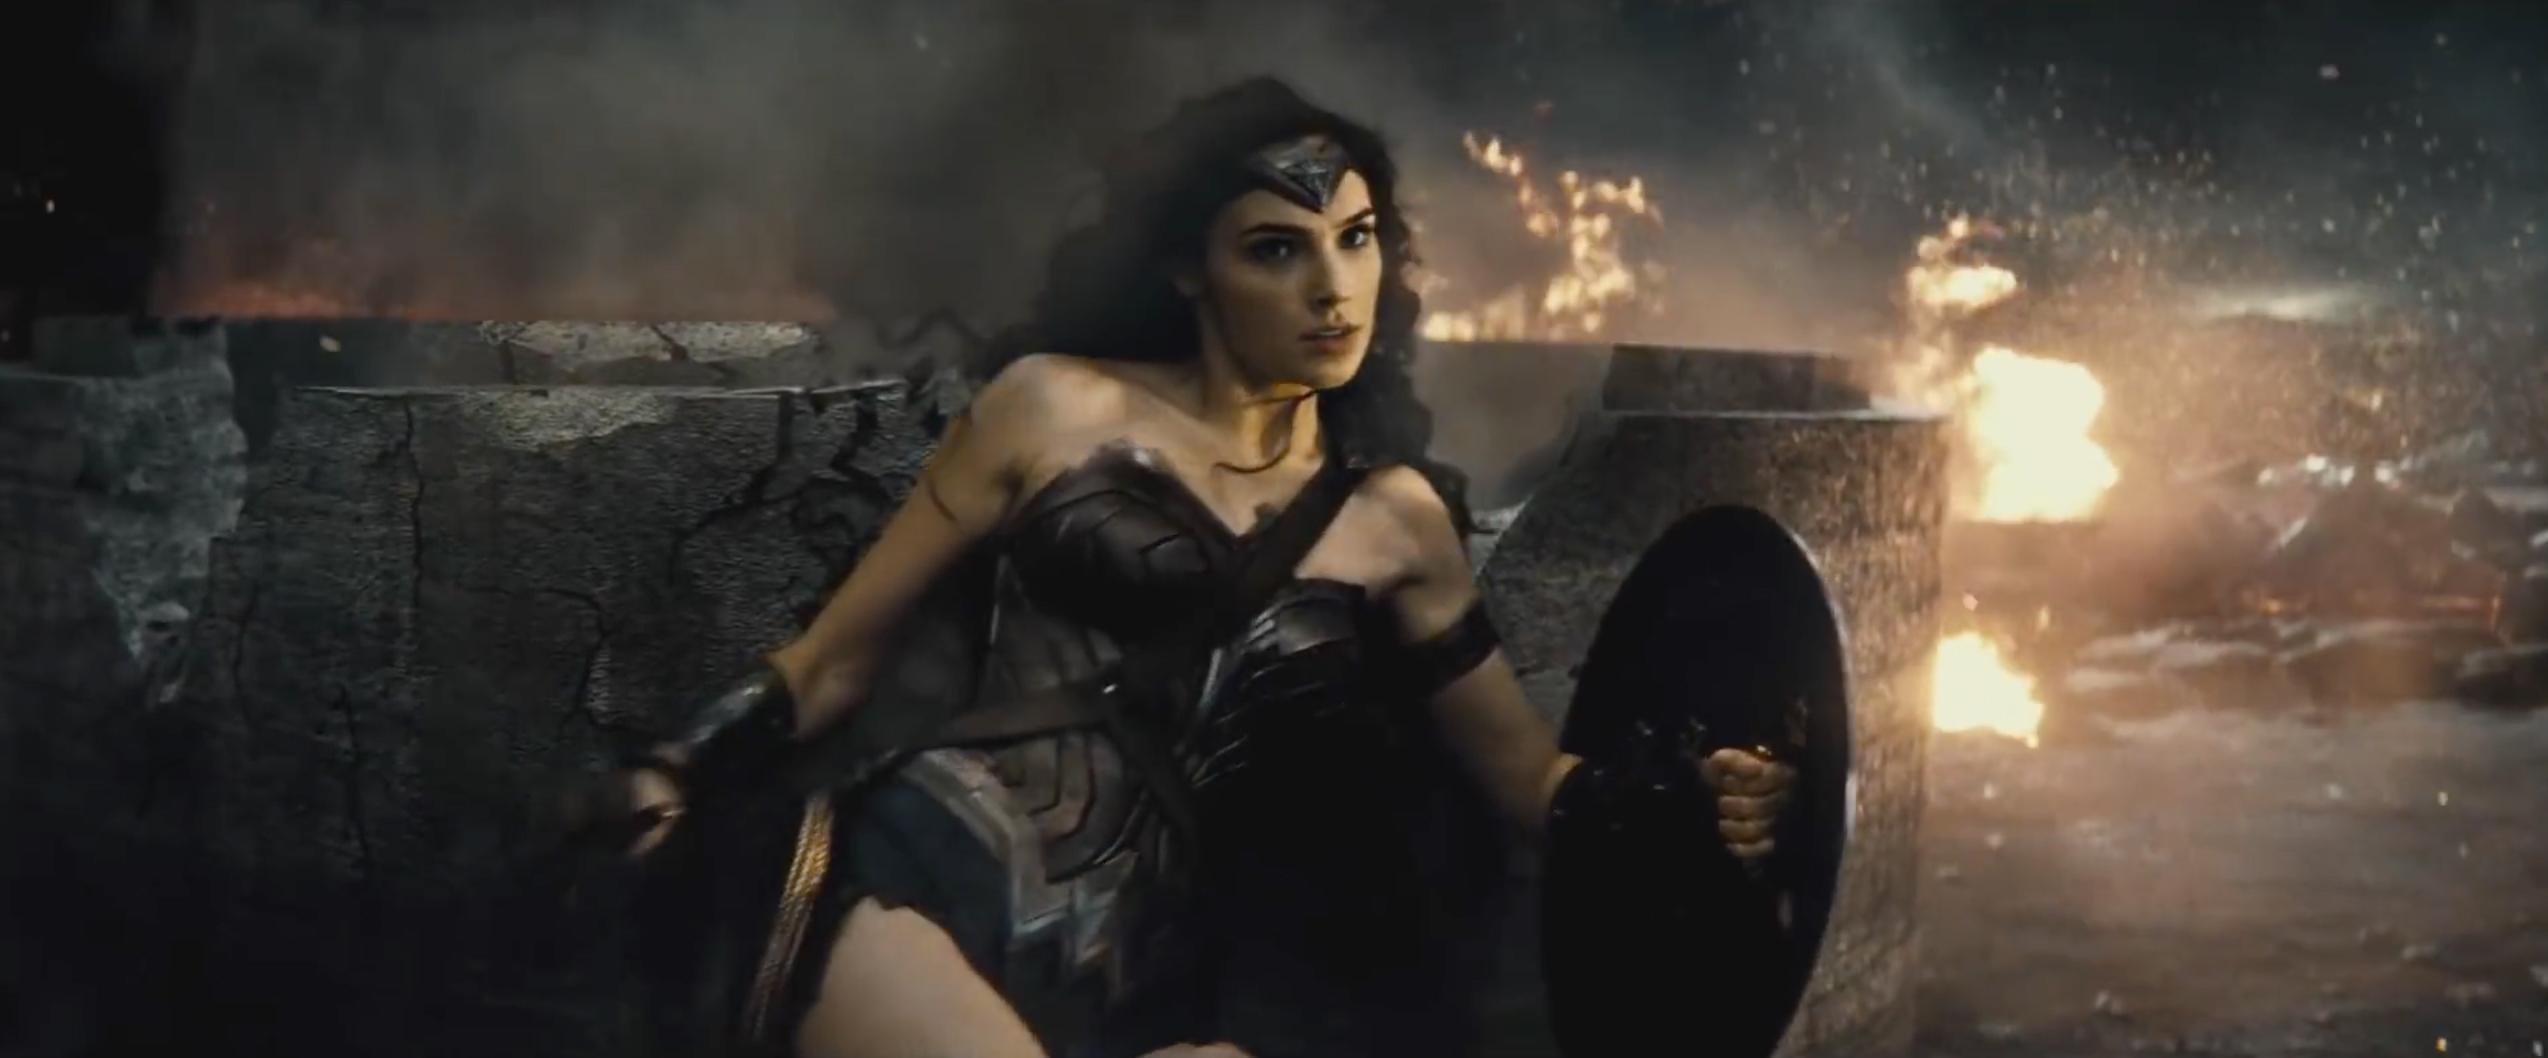 Gal Gadot as Wonder Woman in Warner Bros. 'Batman v Superman: Dawn of Justice'